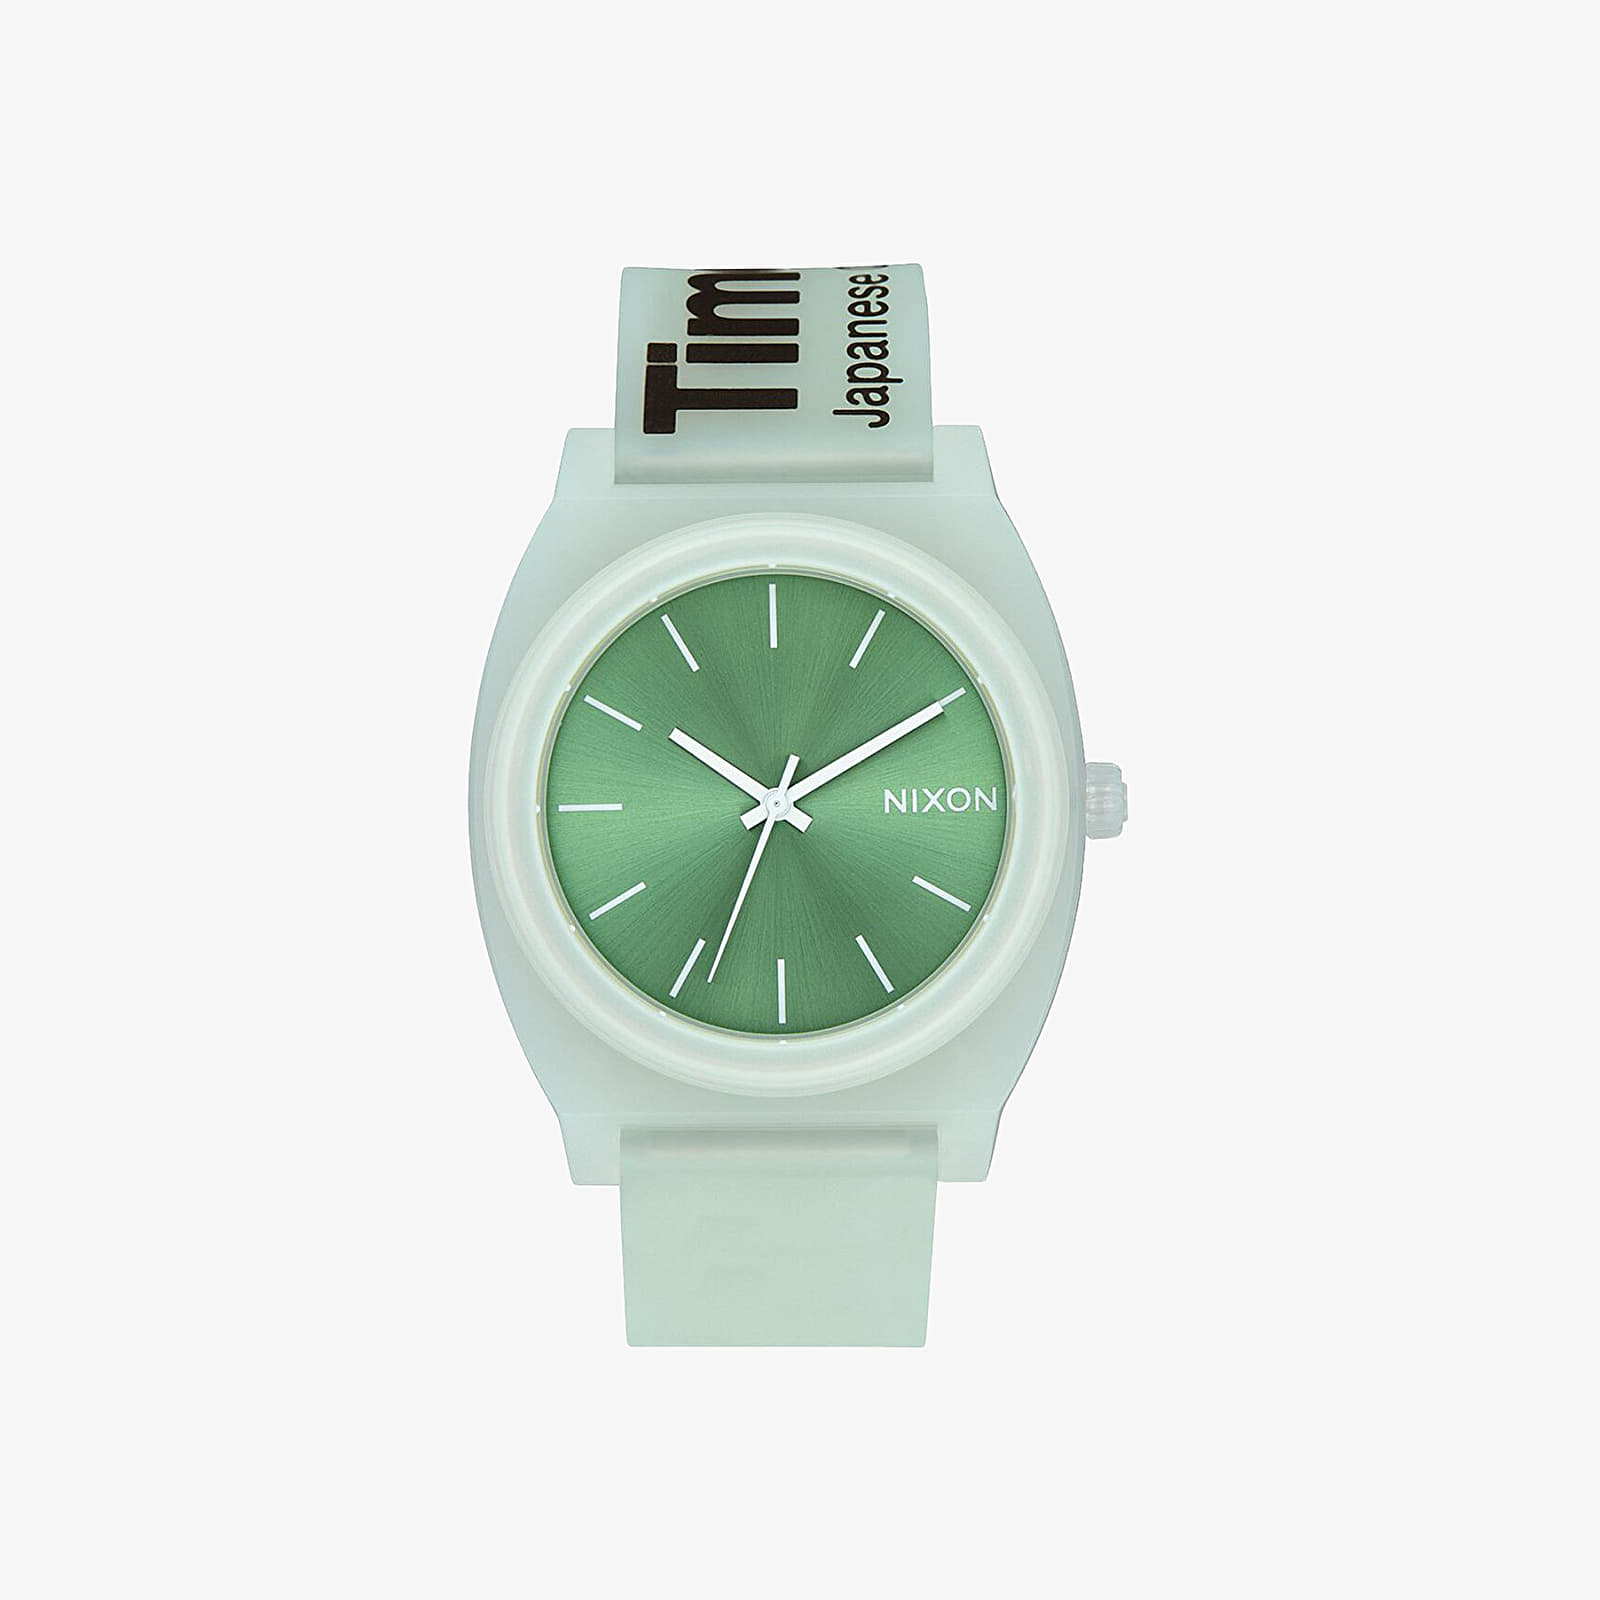 Nixon Time Teller P Watches